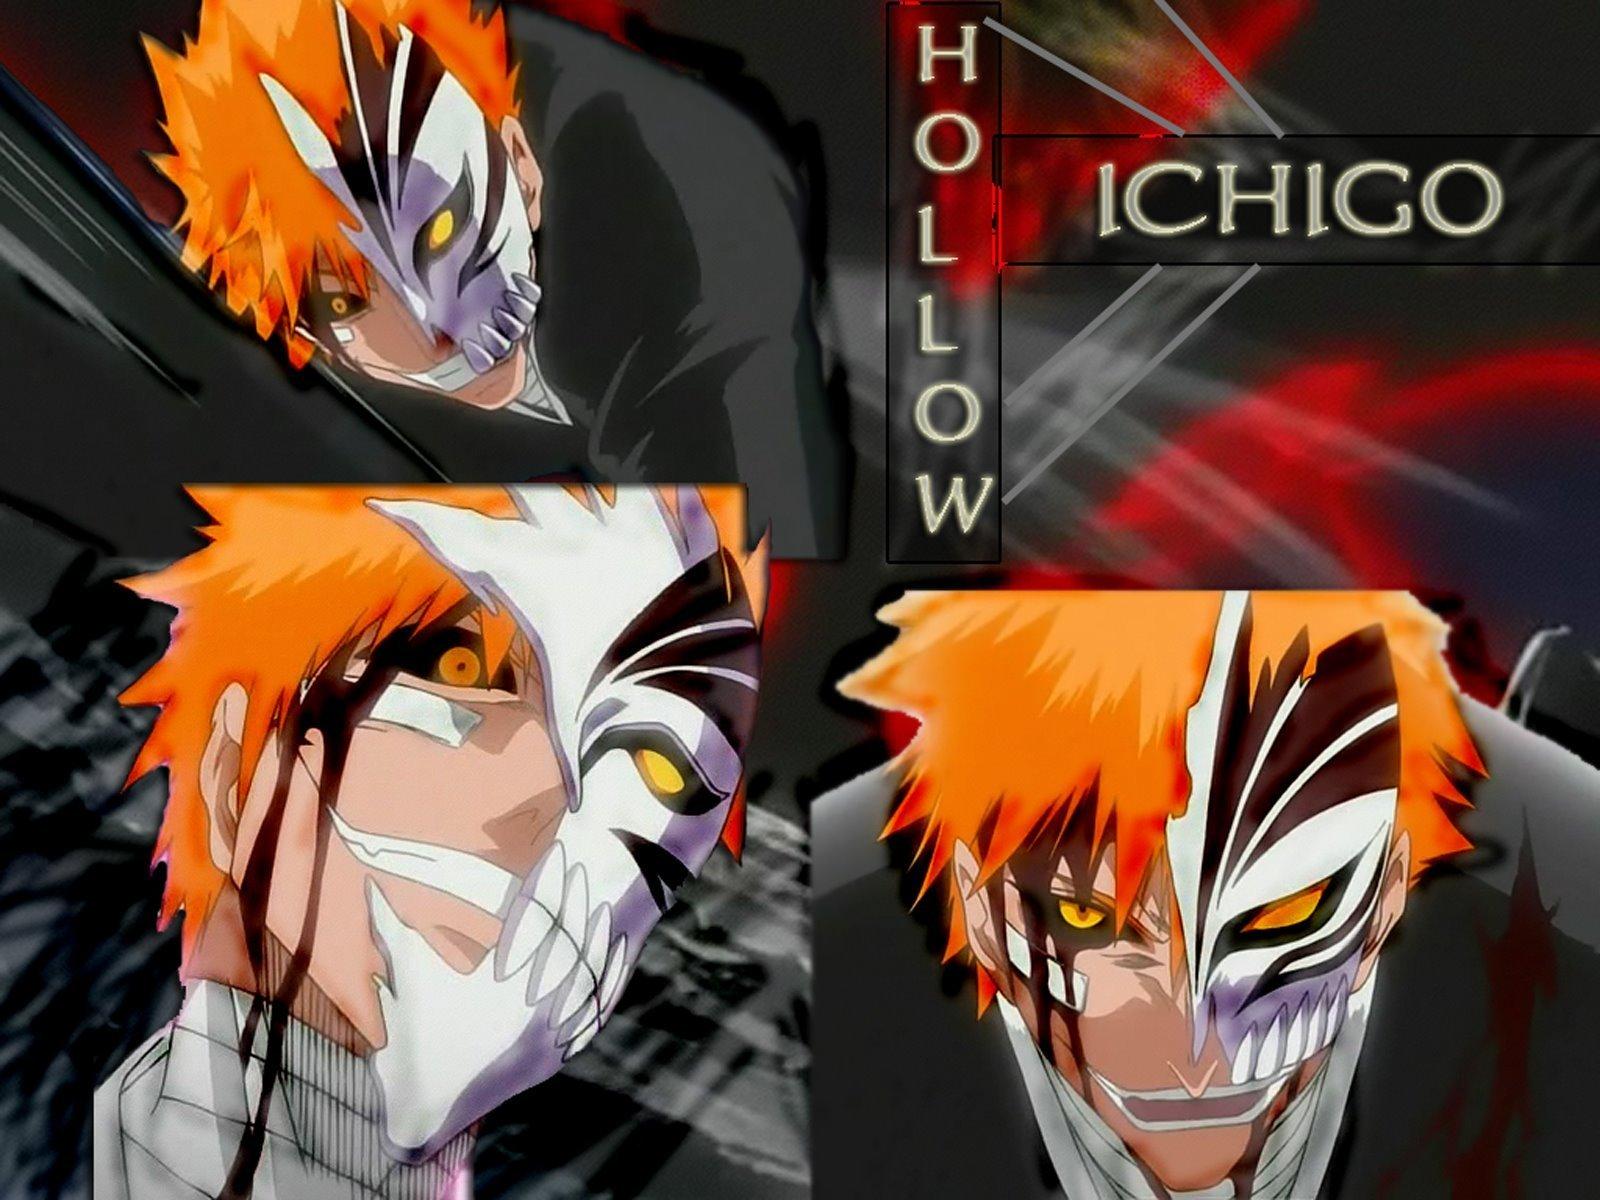 Ichigo H   Hollow Ichigo Wallpaper 5791180 1600x1200